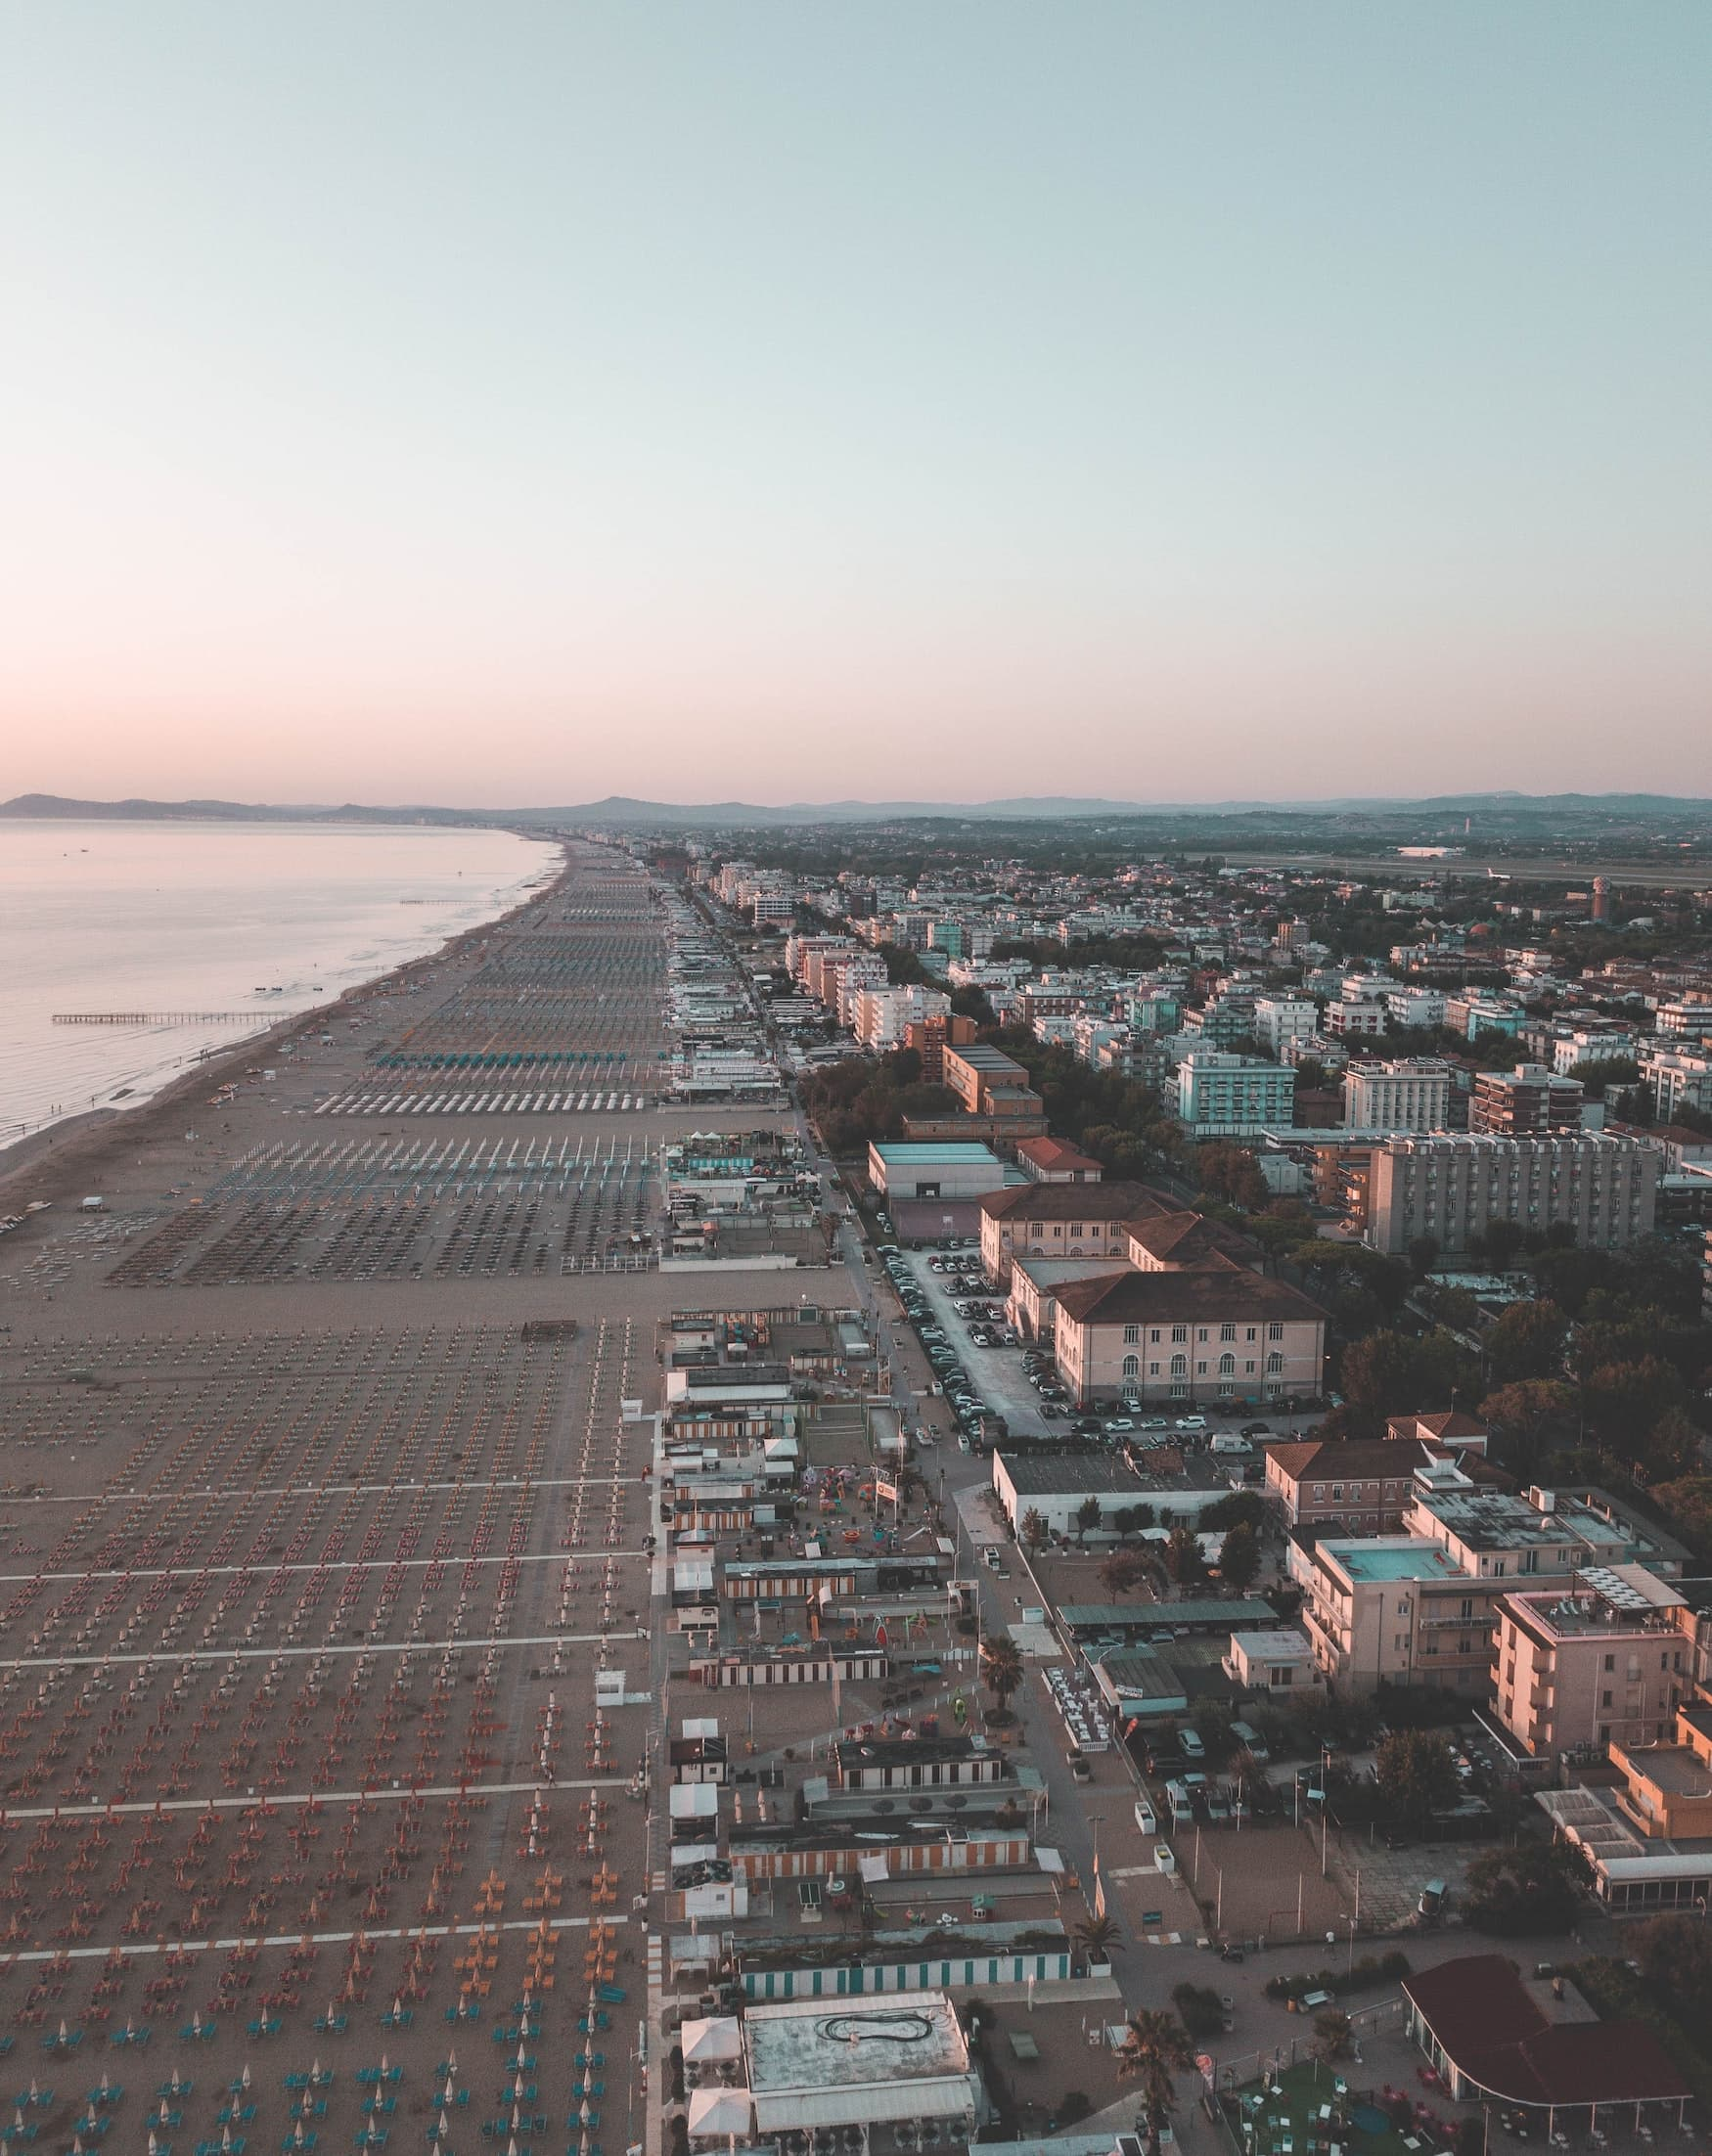 Sonnenuntergang über dem Strand von Rimini